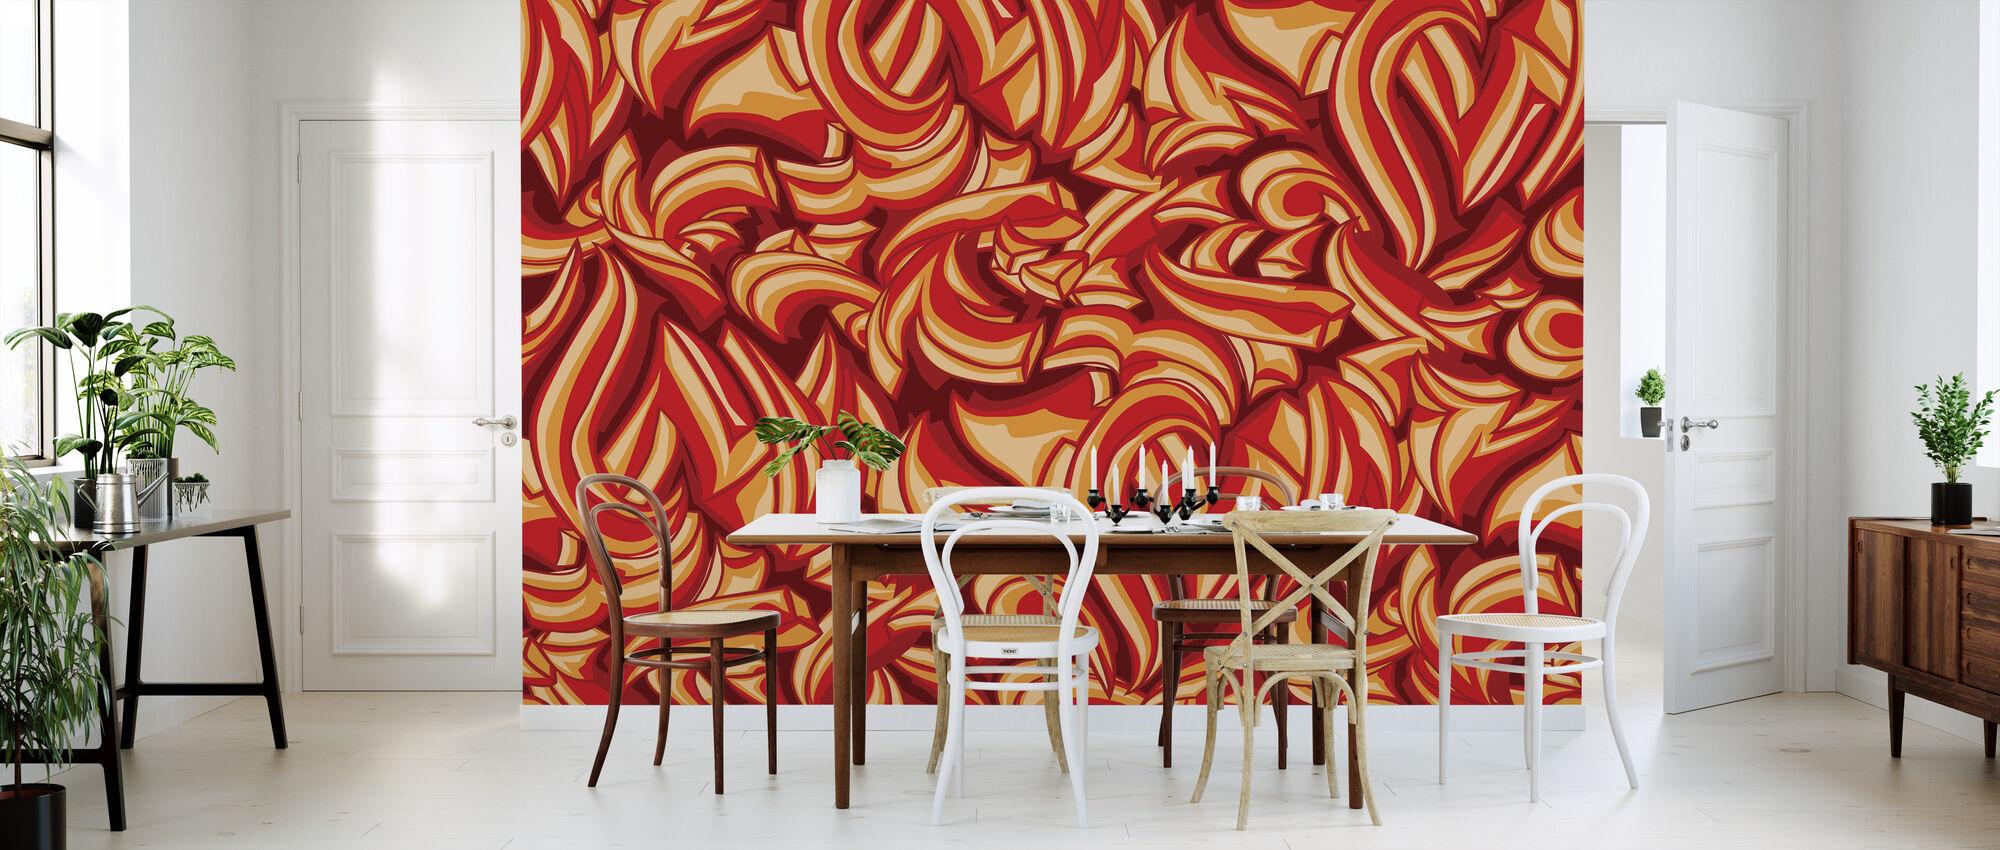 Sketchy Splat Graffiti - Wallpaper - Kitchen